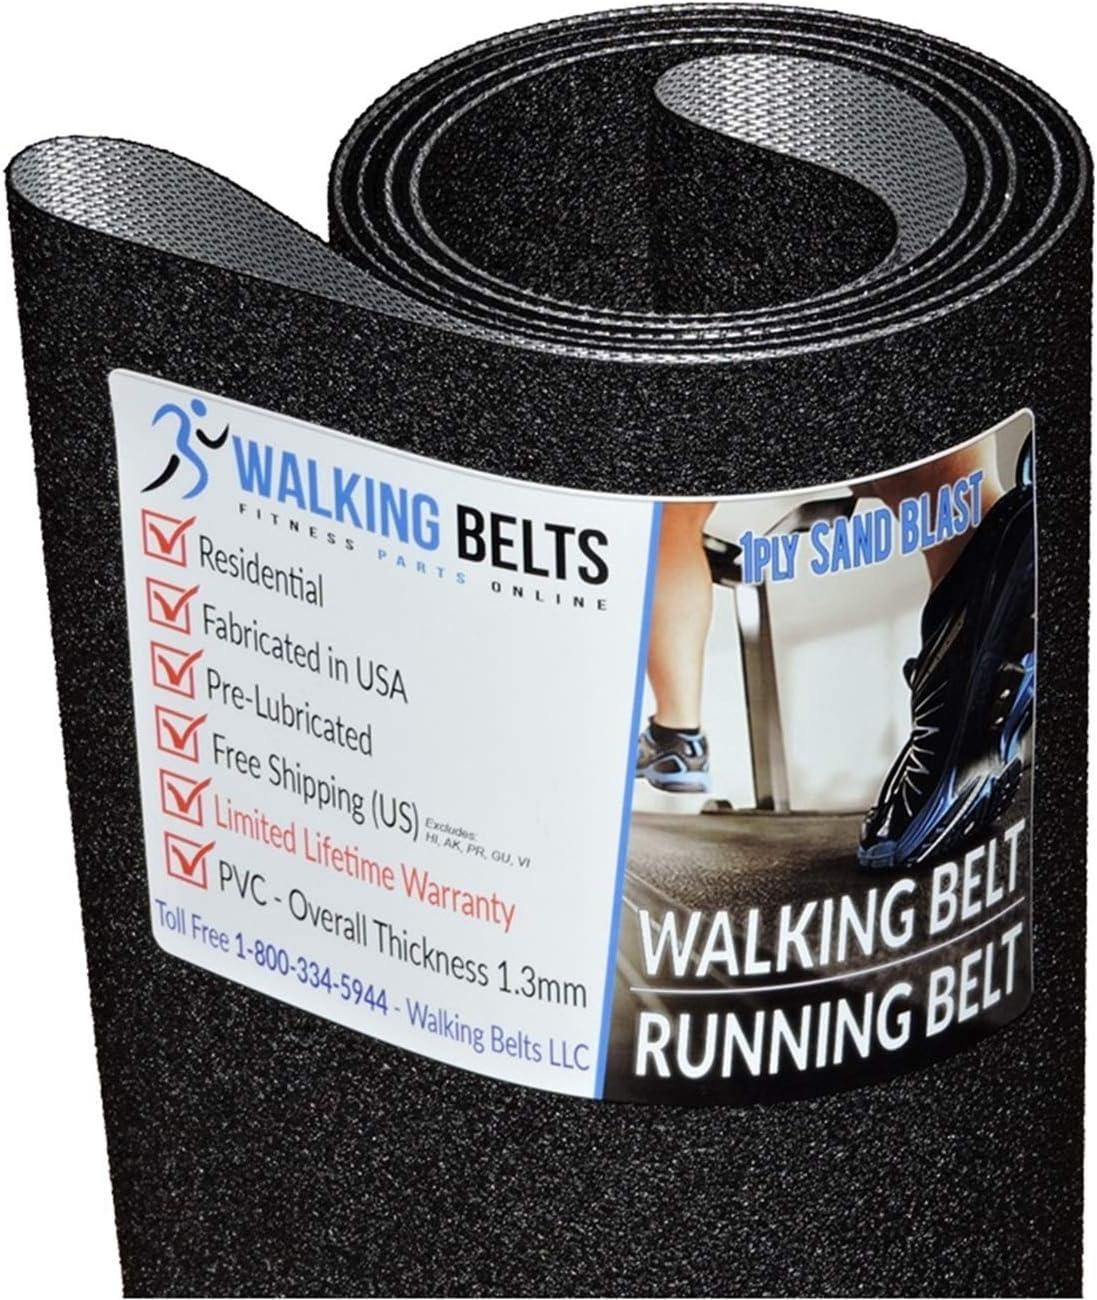 Courier shipping free shipping WALKINGBELTS Walking Max 48% OFF Belts LLC - Run Treadmill ALL815 Alliance